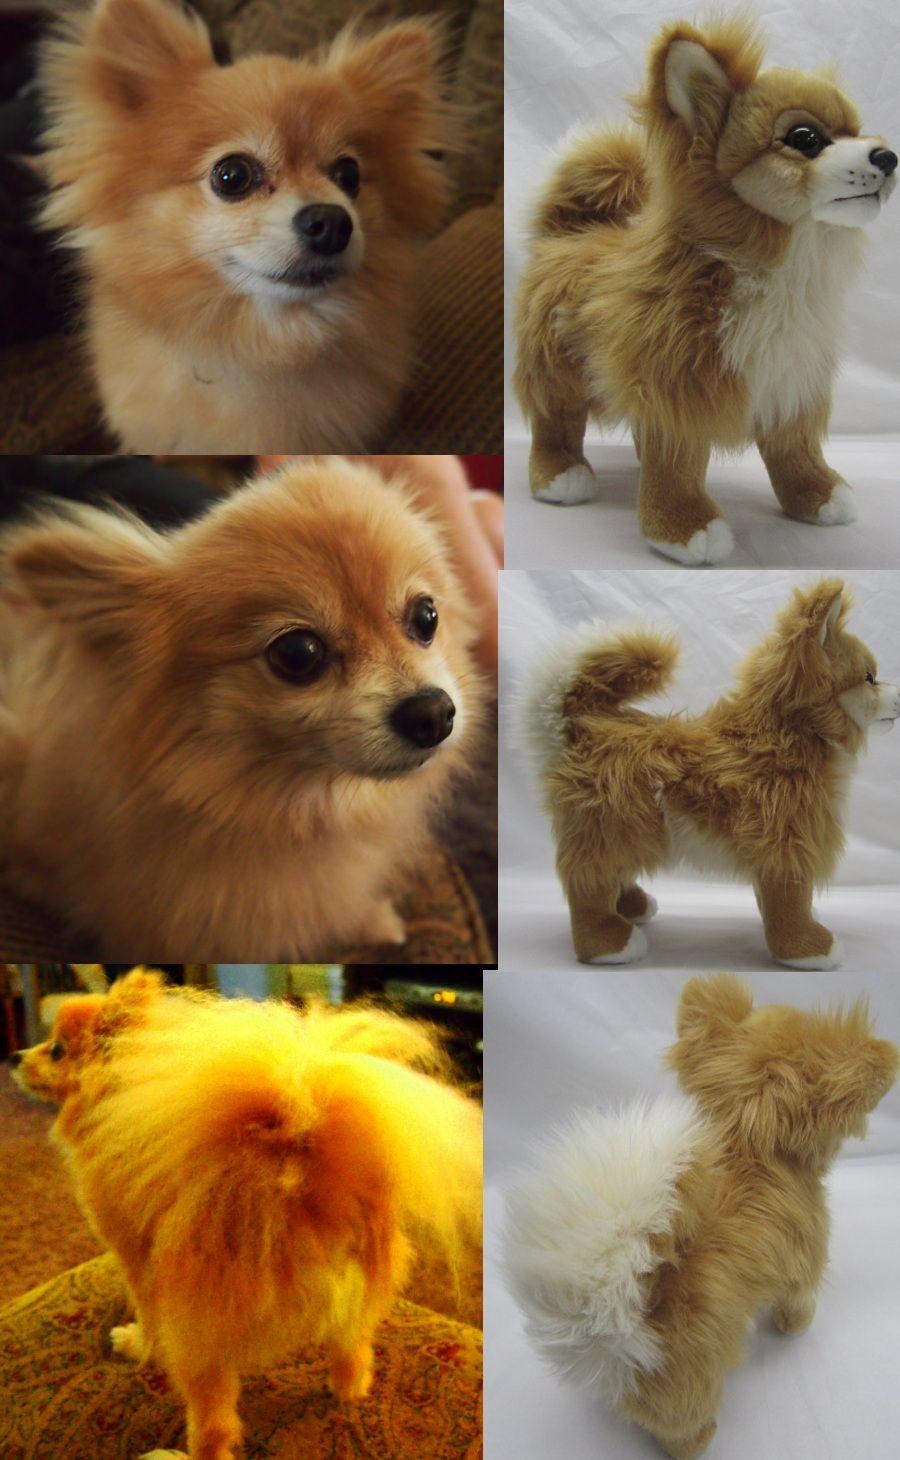 Custom stuffed animals made to look like your dog. We call